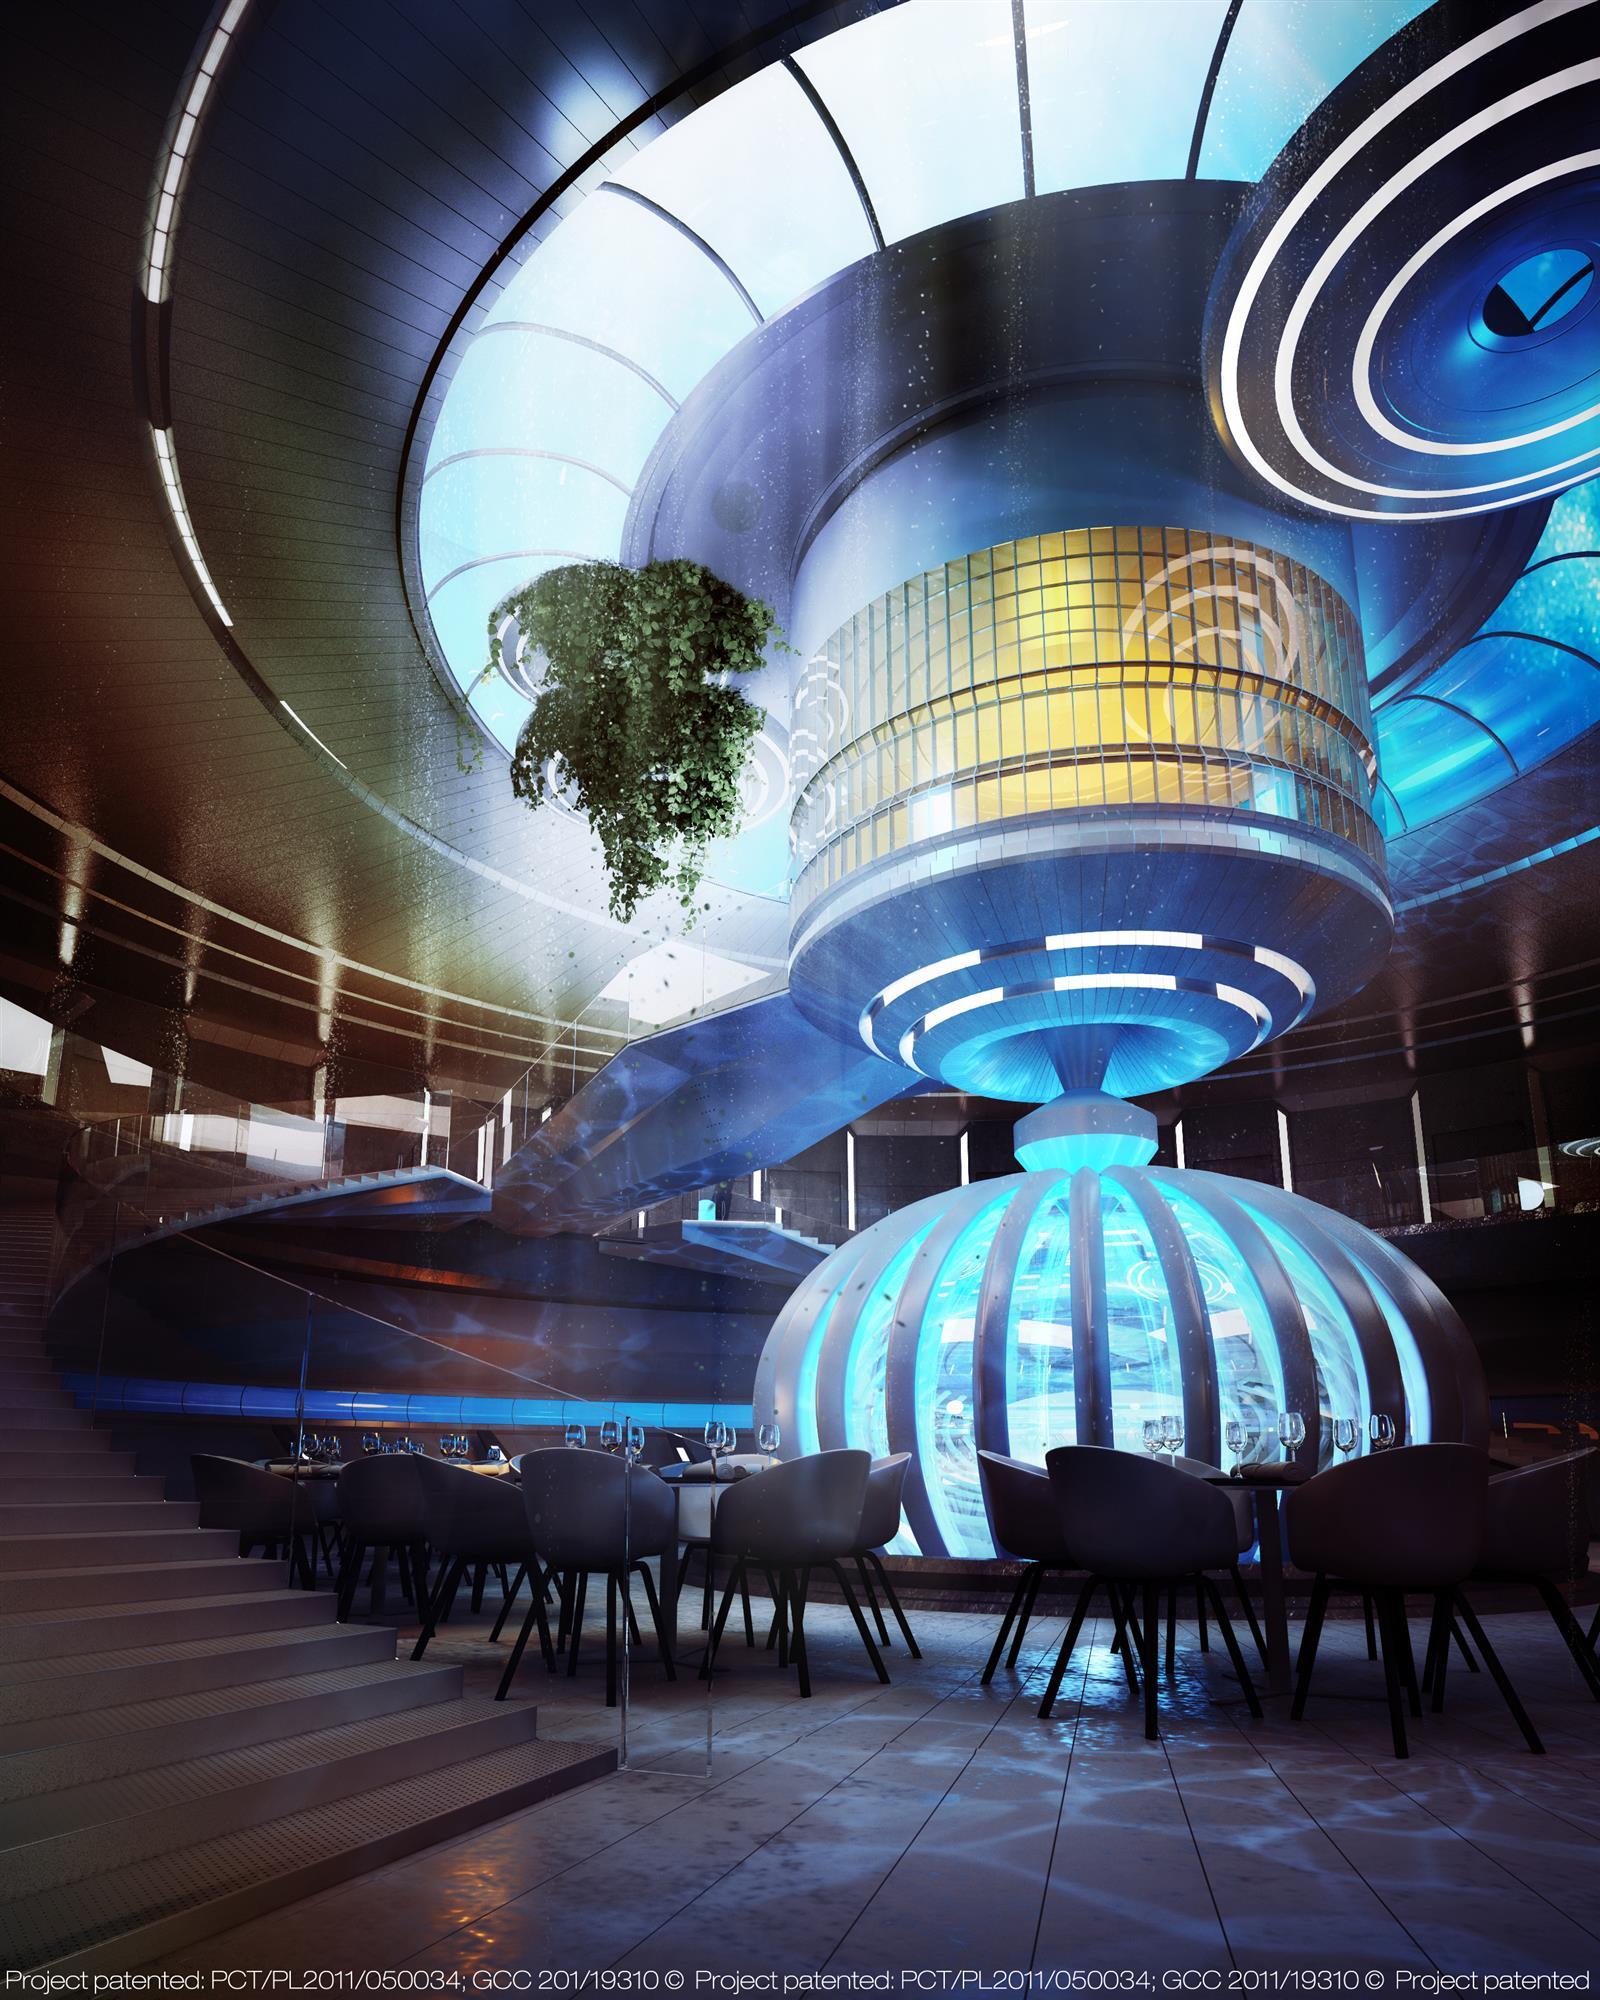 Water Discus Underwater Hotels In Dubai (11)